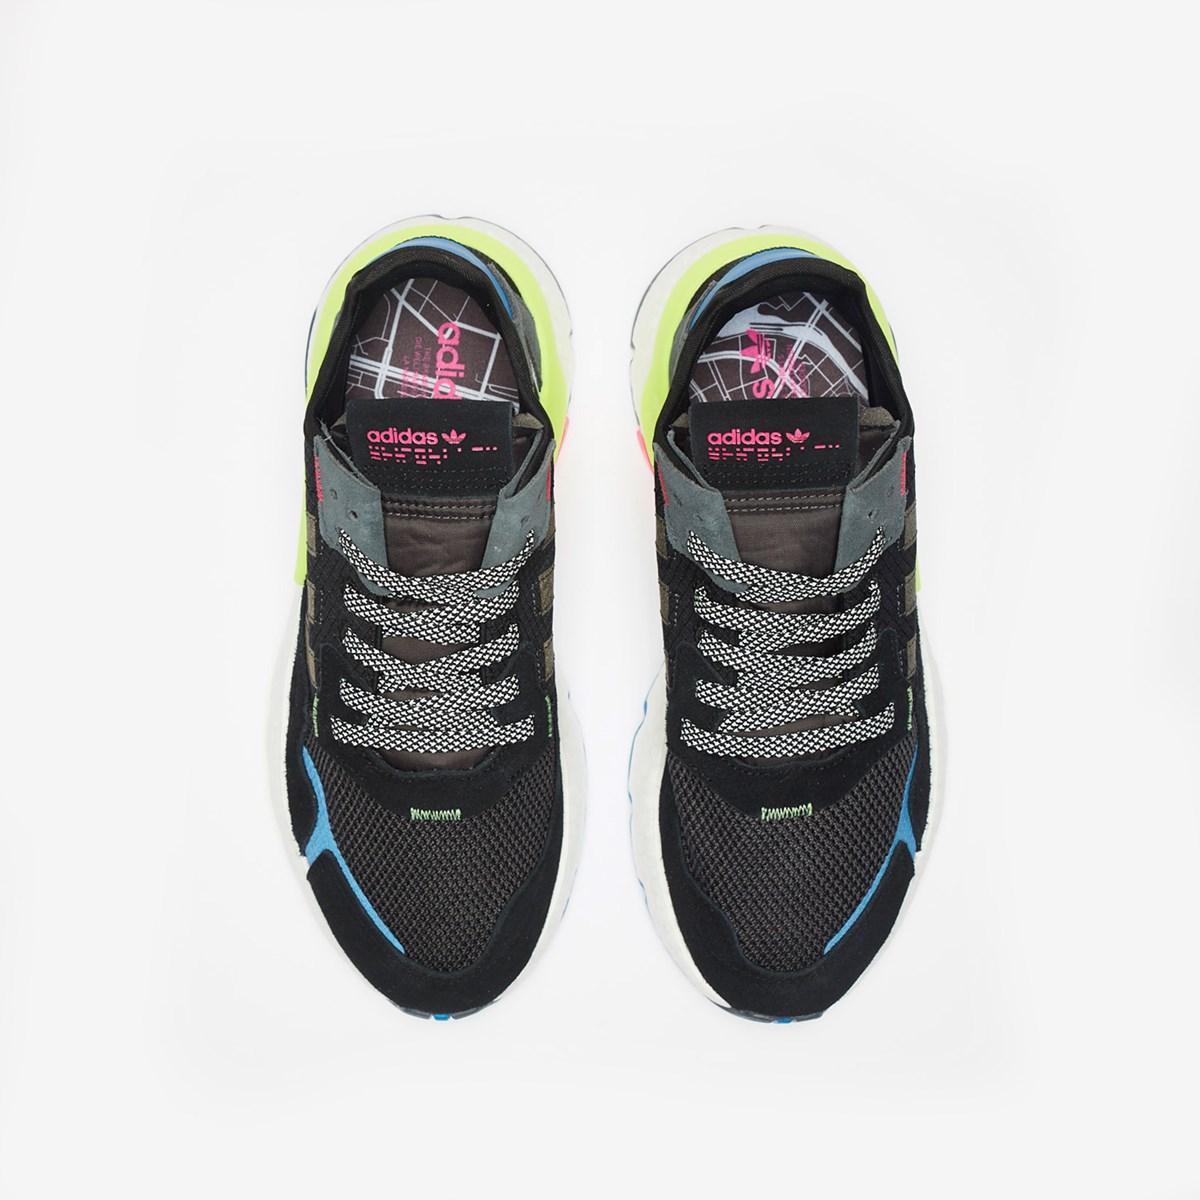 adidas Nite Jogger - Ee9462